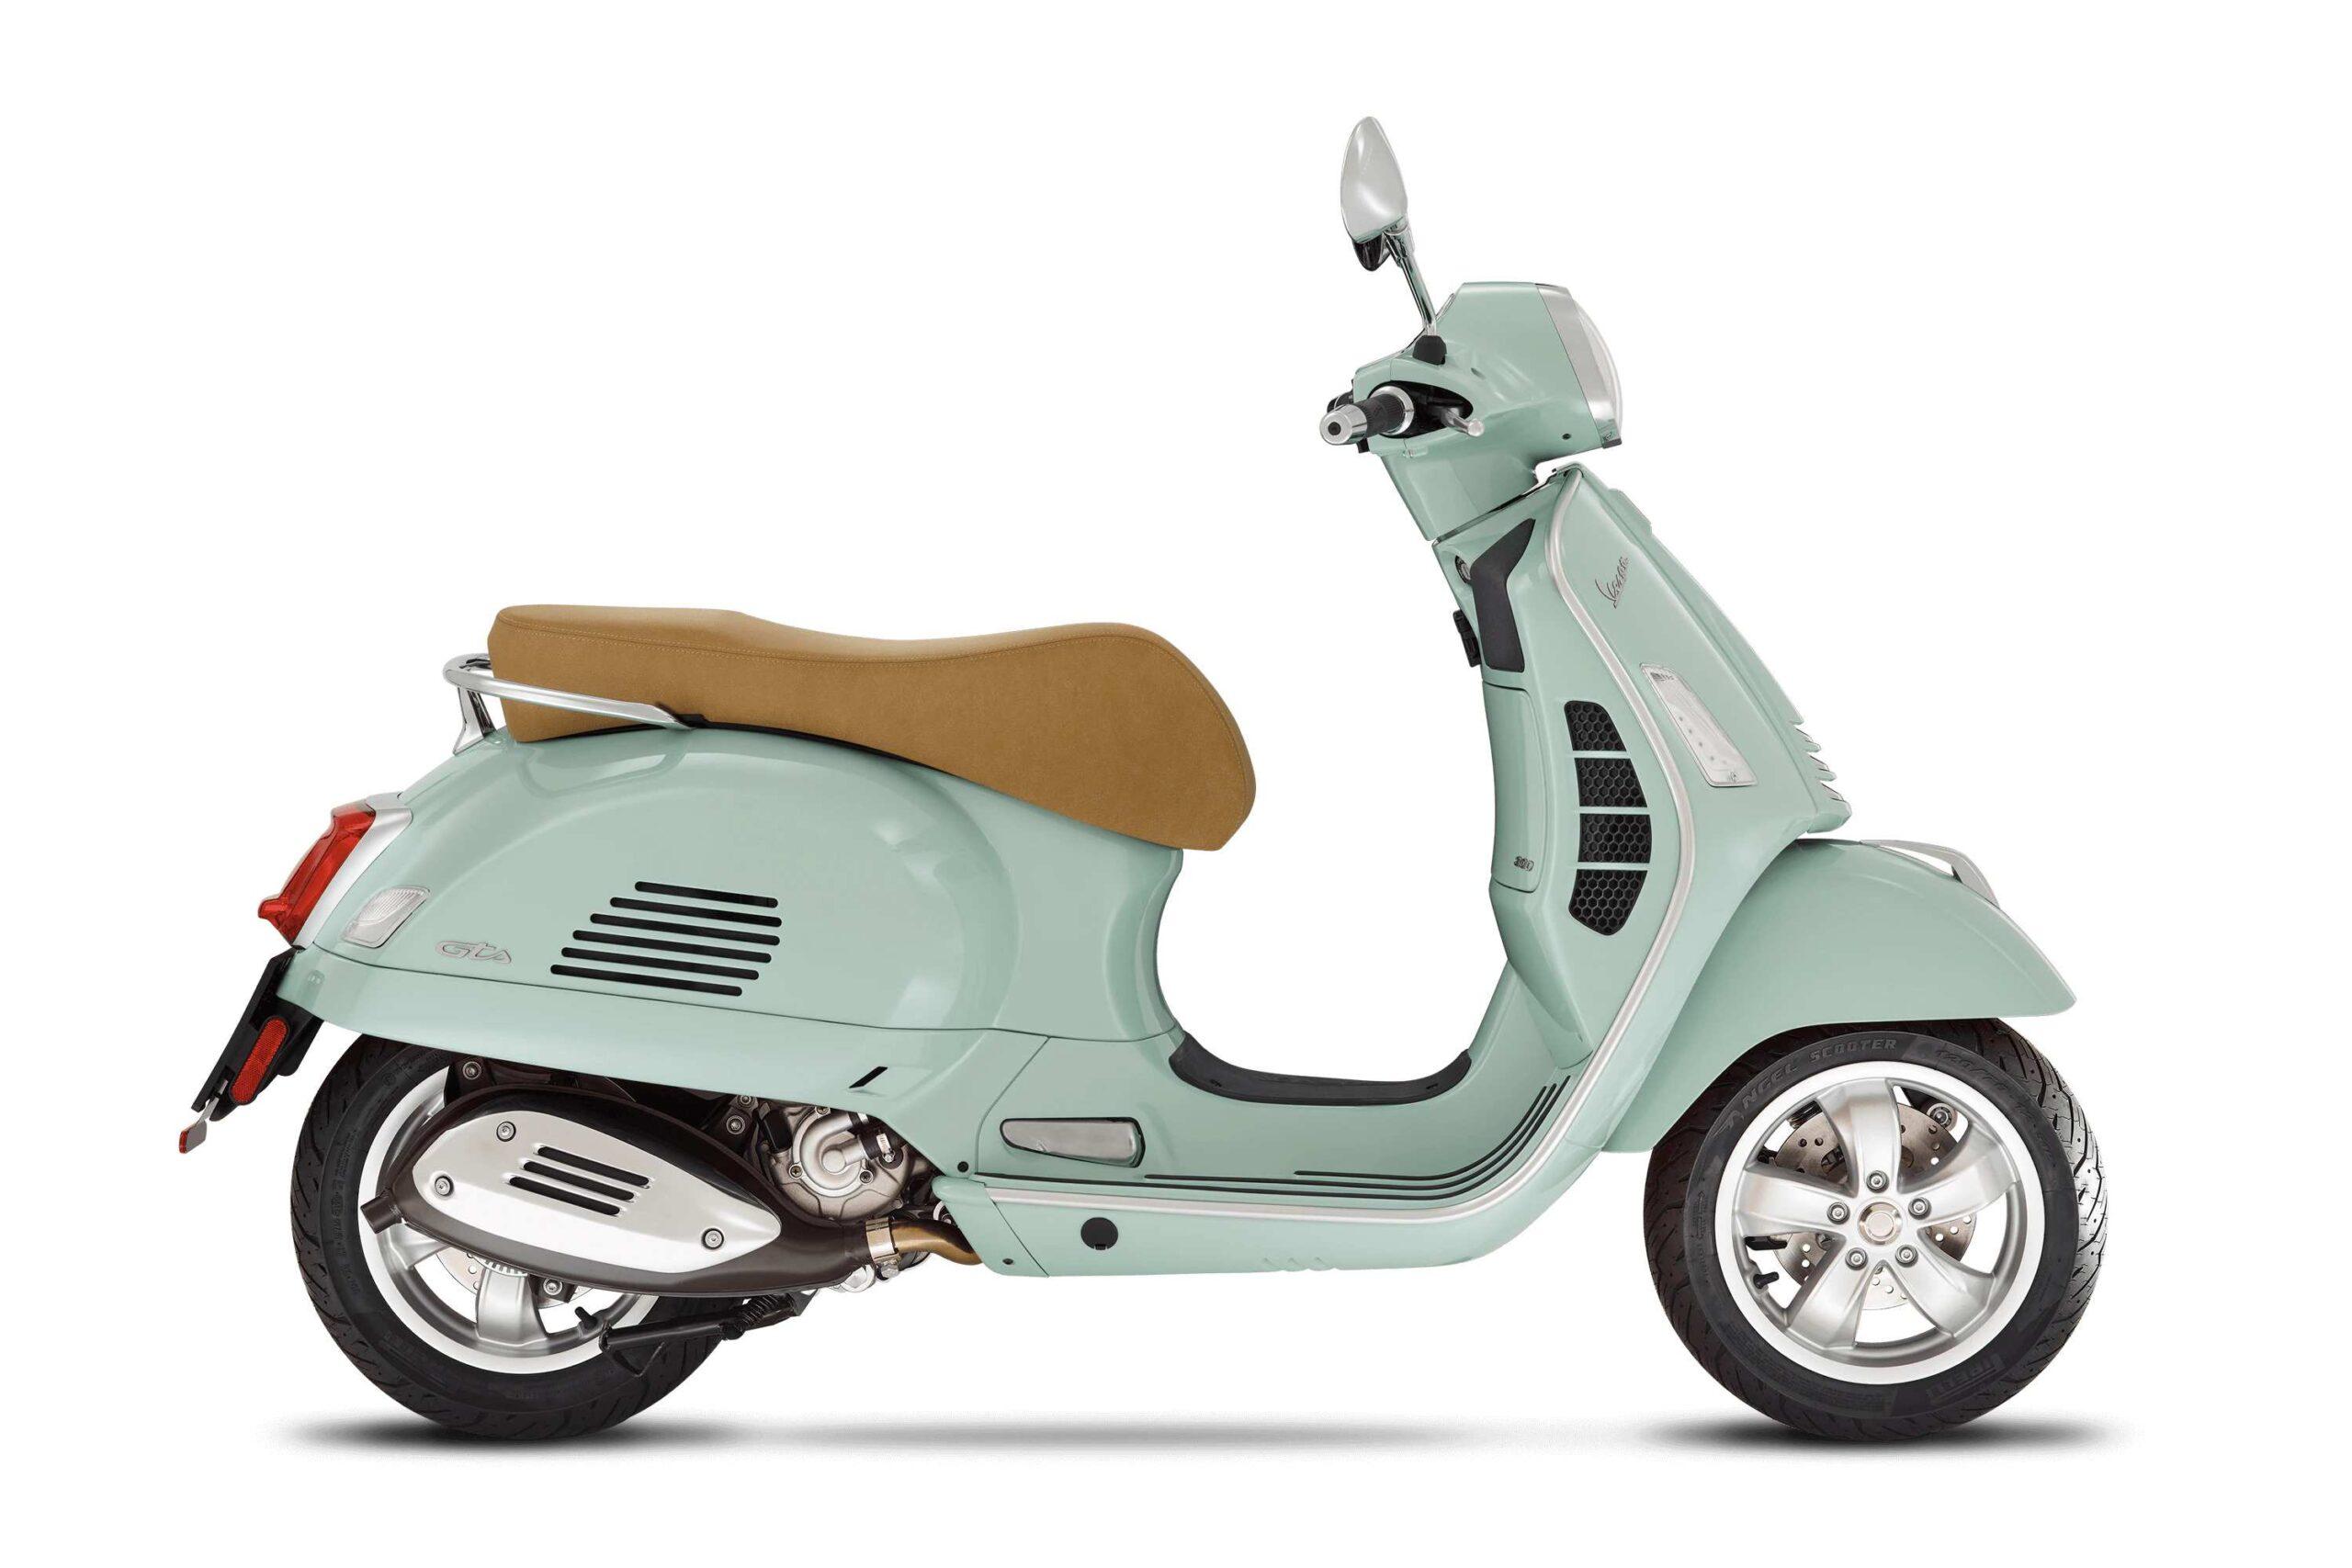 Vespa gts-300-euro5 Motos Pericot Girona